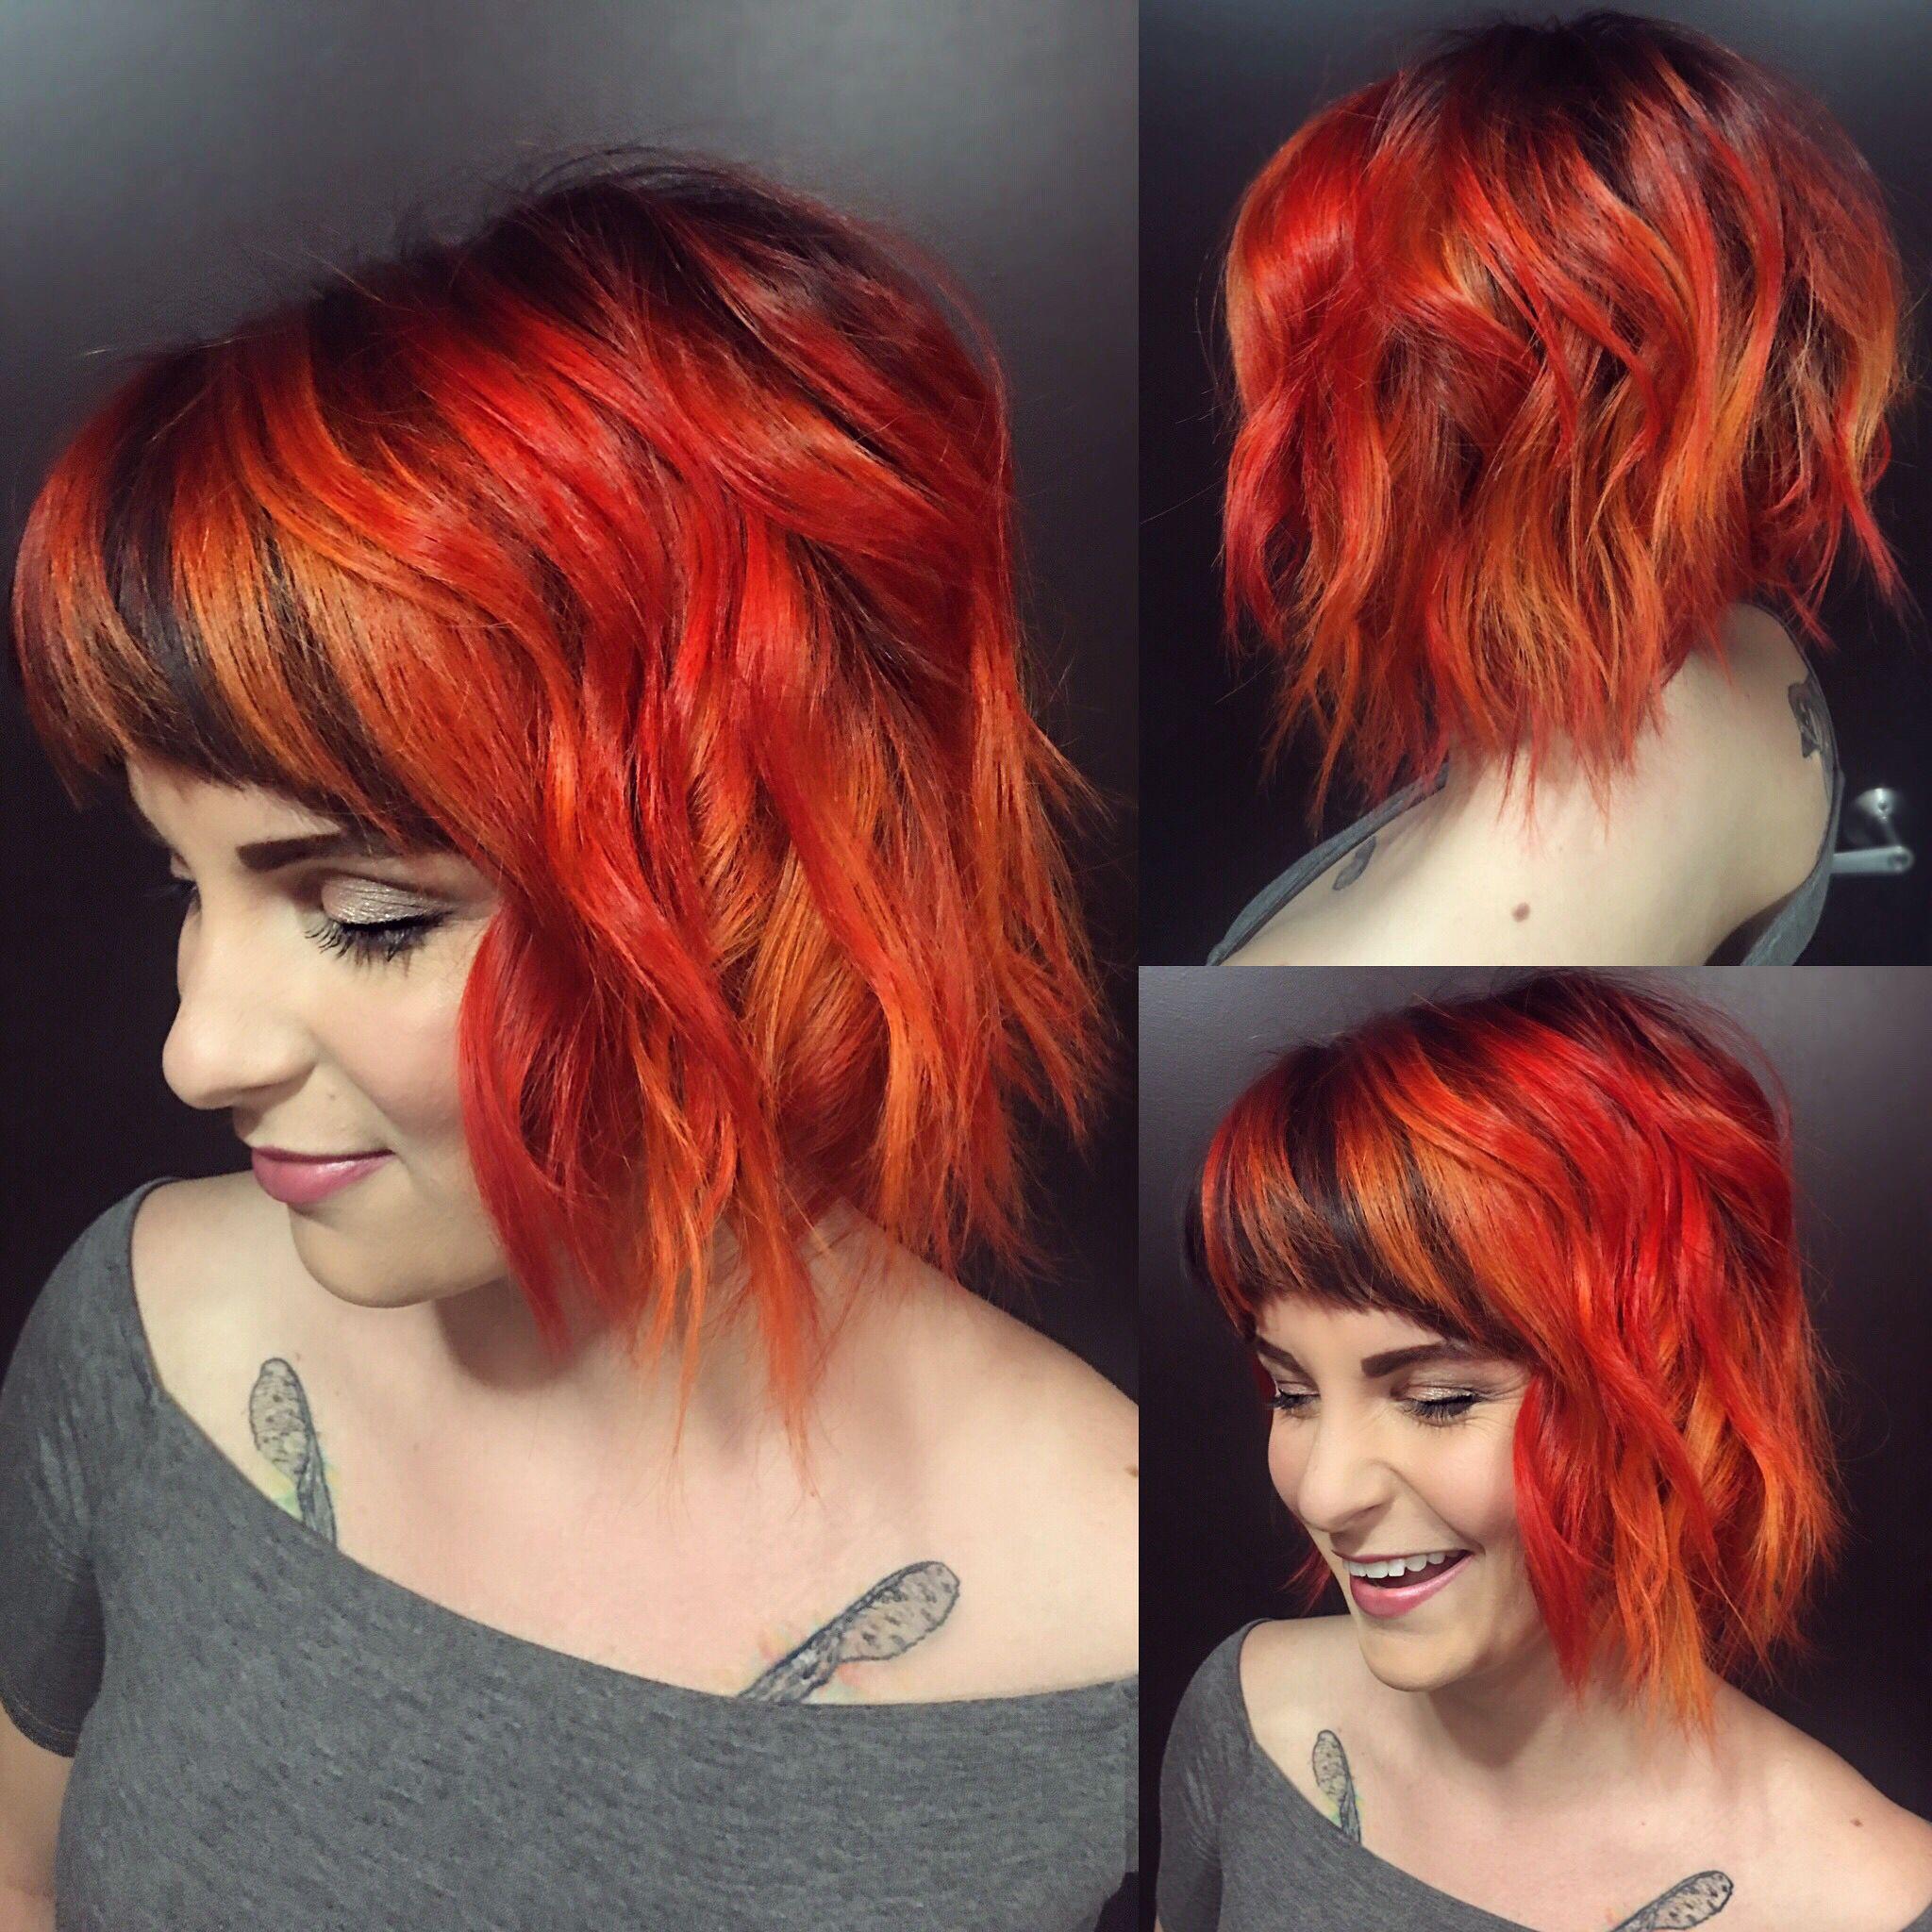 Custom Mixed Pravana With Red Oranges And A Shadowed Dark Root Dark Orange Hair Hair Inspiration Color Hair Color Orange